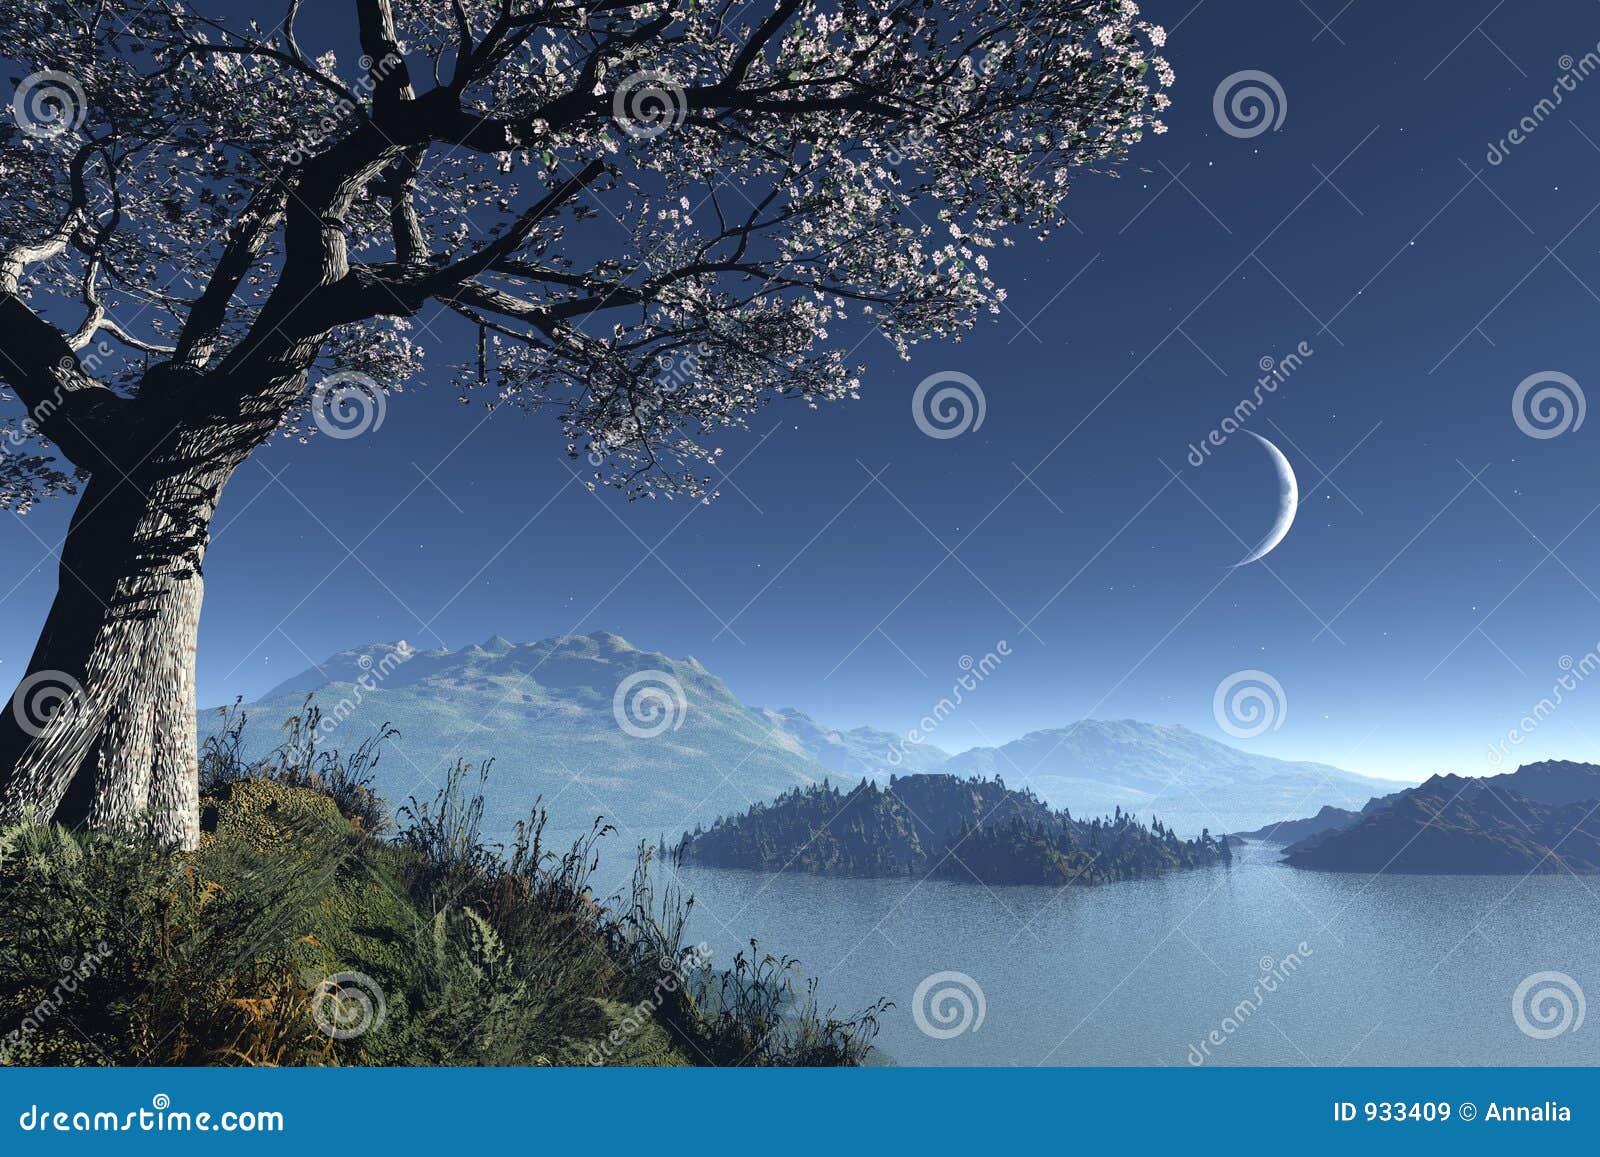 Romantic night landscape